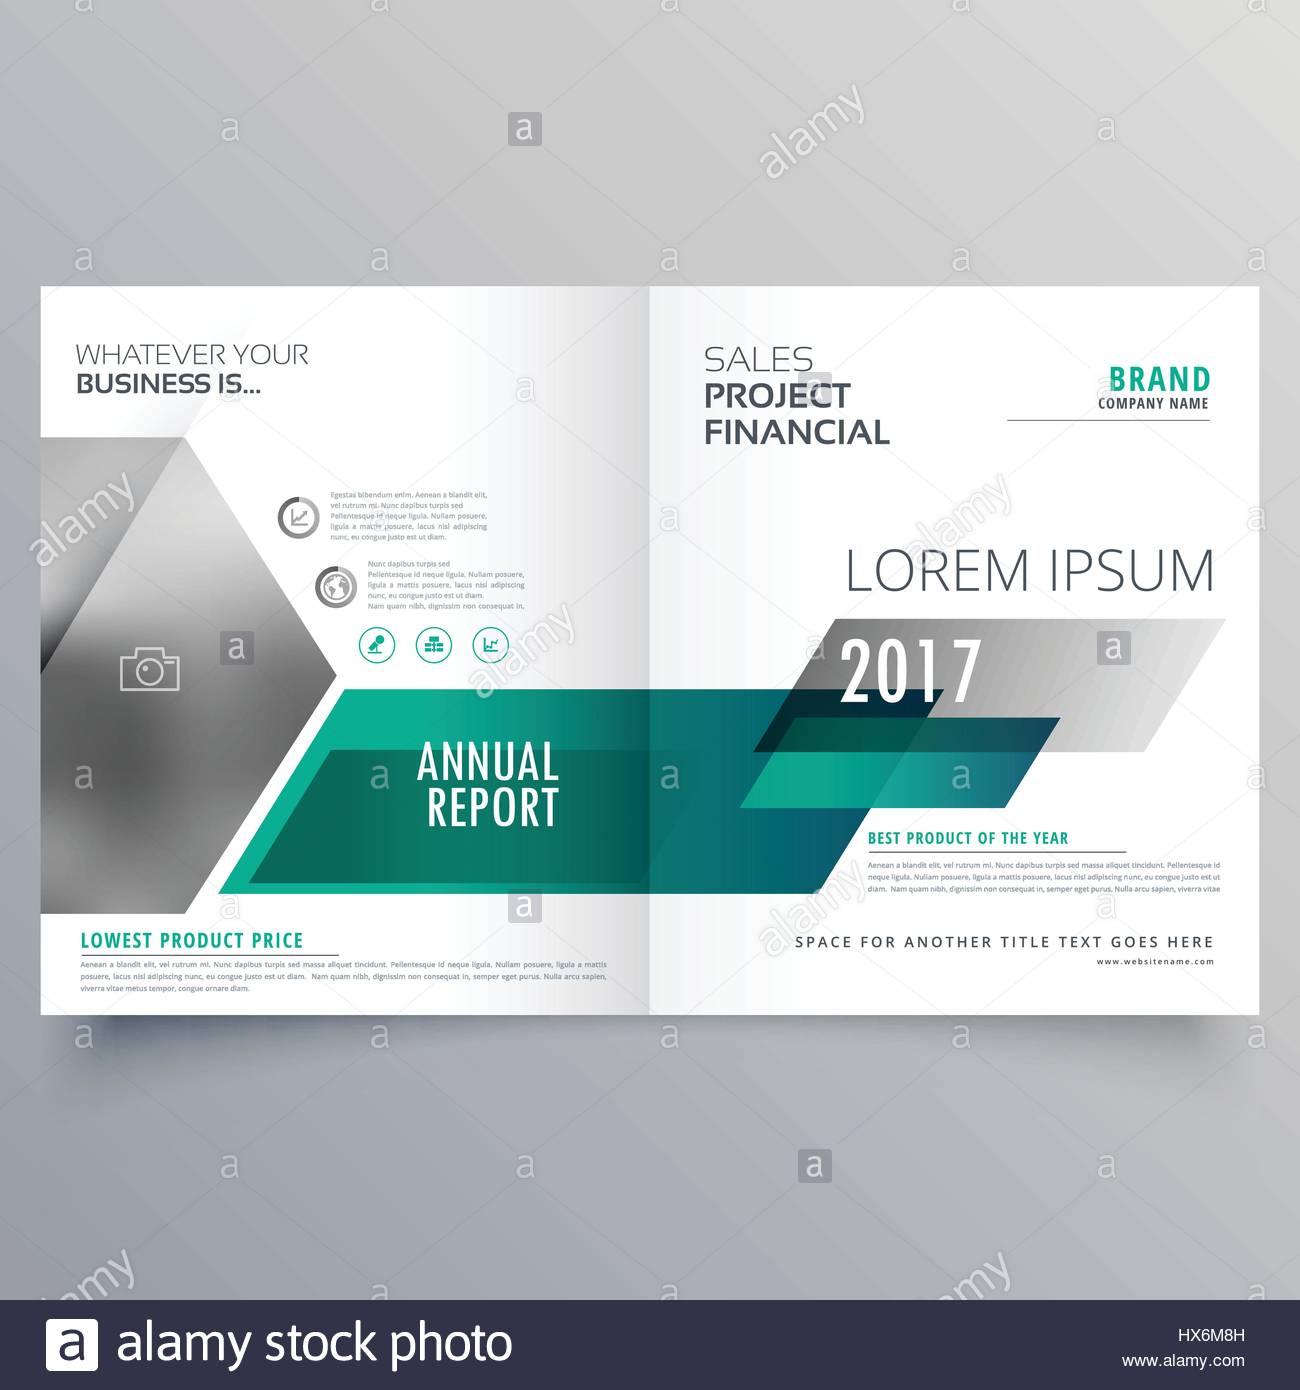 modern bifold brochure template design for your brand - Bi Fold Brochure Template